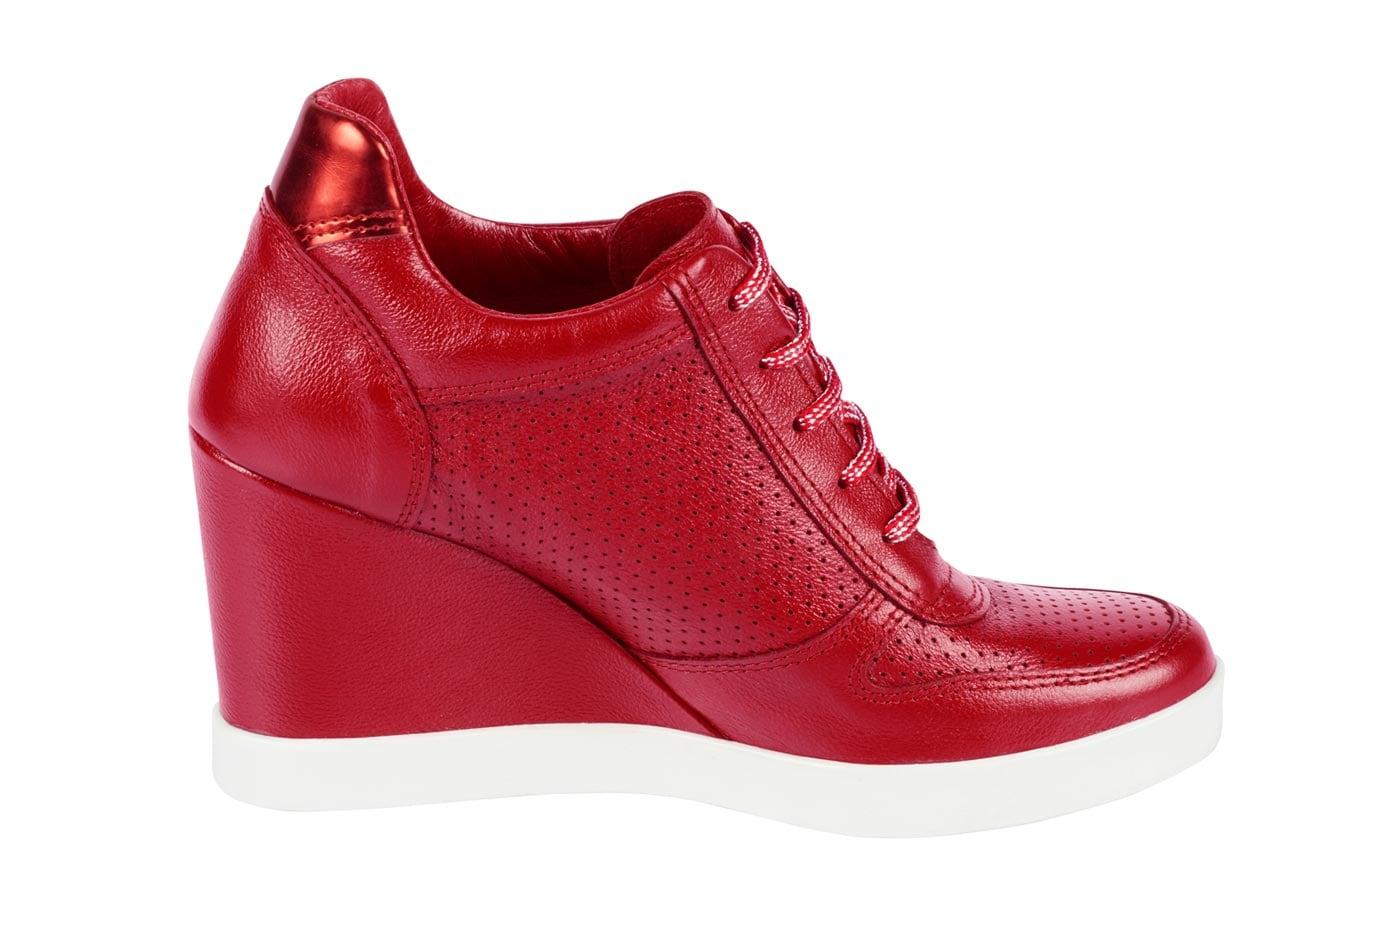 heine -  Keilsneaker